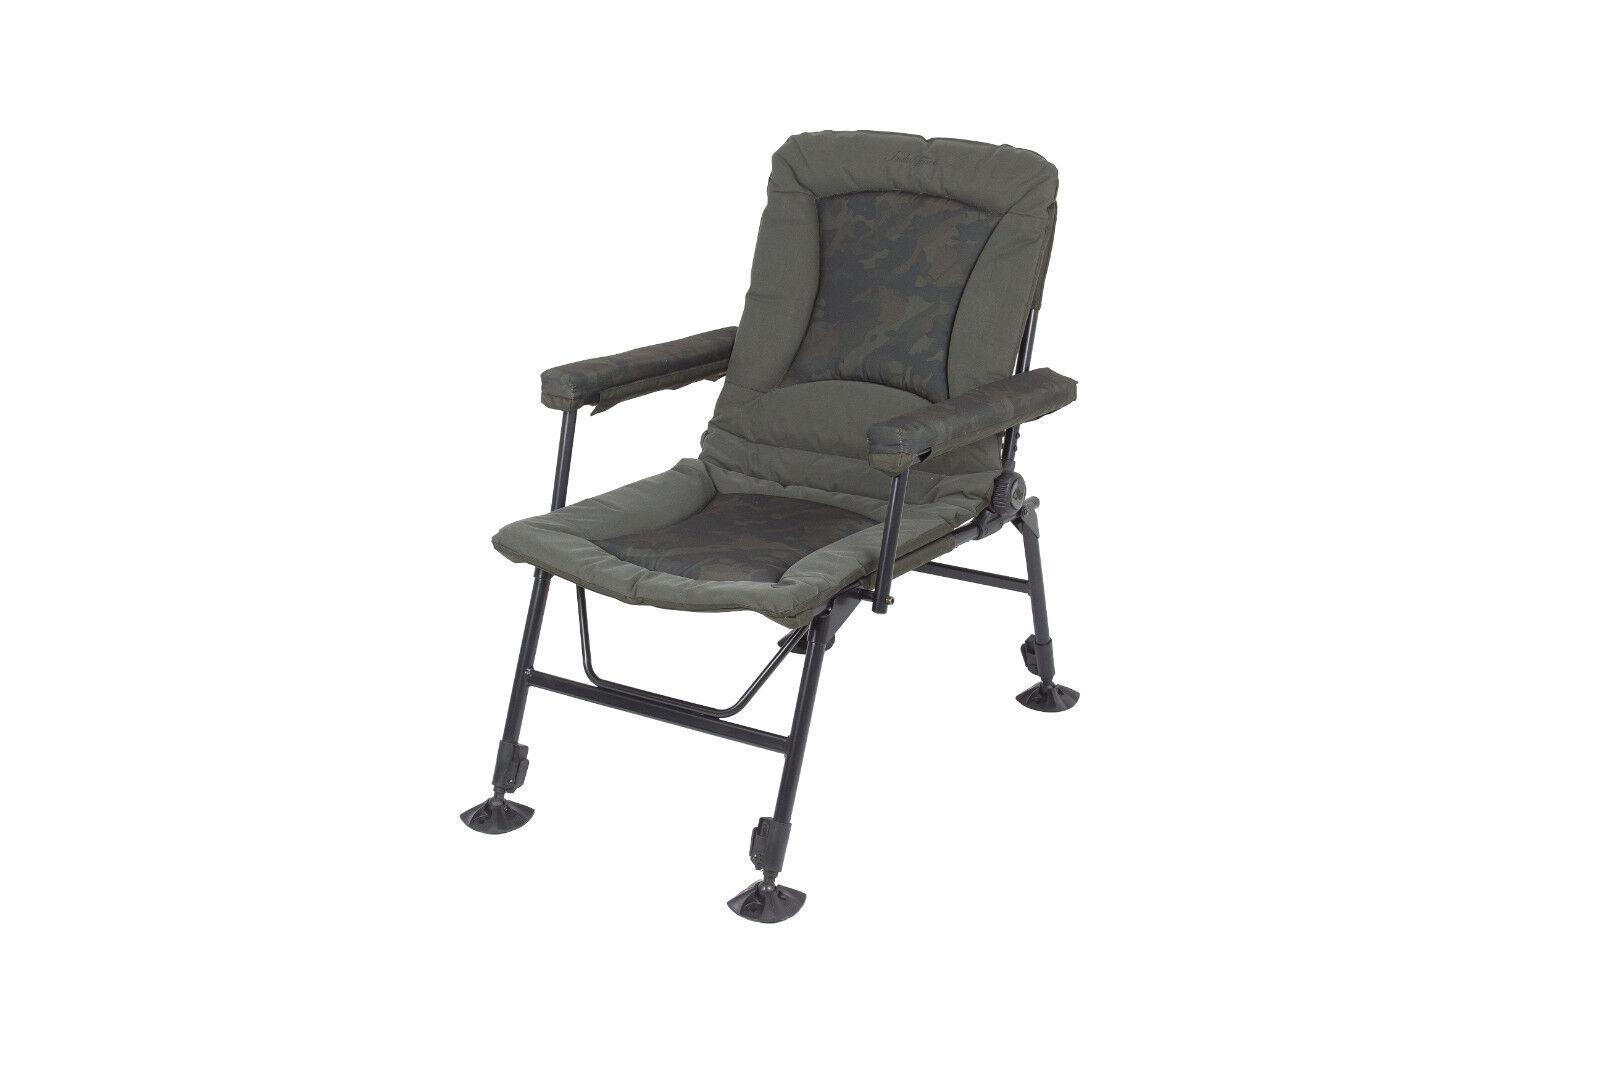 Nash  Indulgence Daddy Long Legs Camo Chair T9751 Karpfenstuhl Angelstuhl  honest service